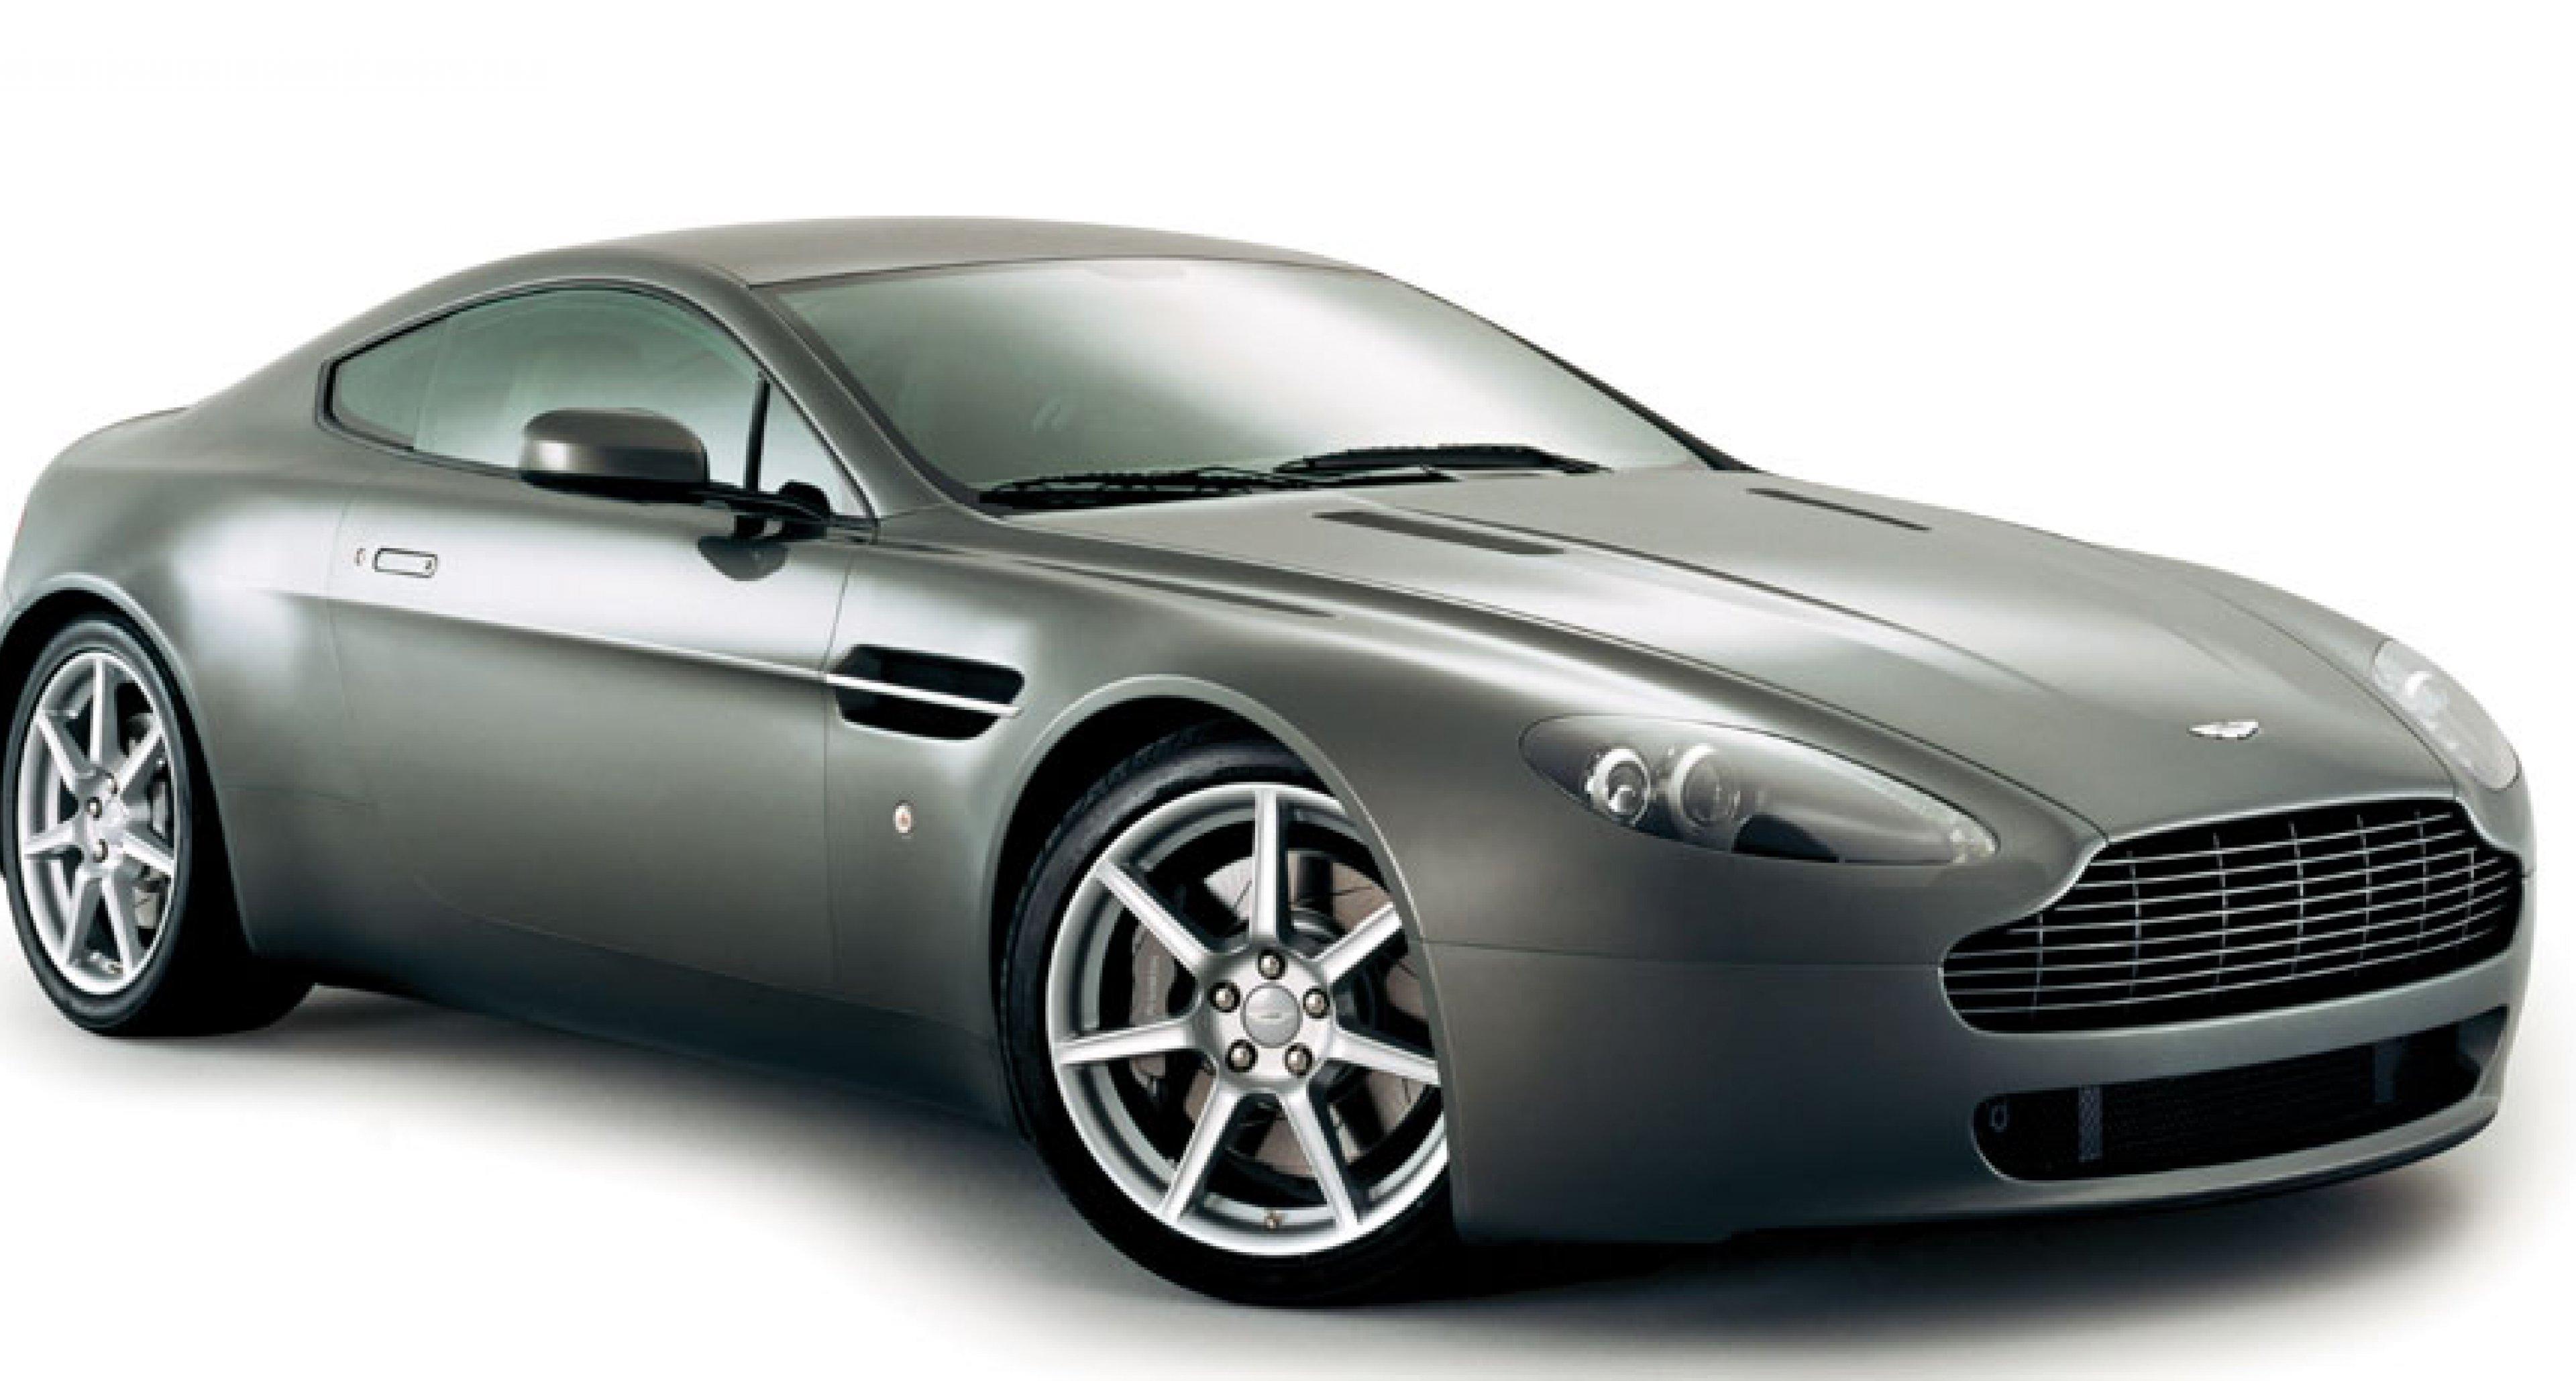 Aston Martin V8 Vantage launched at Geneva